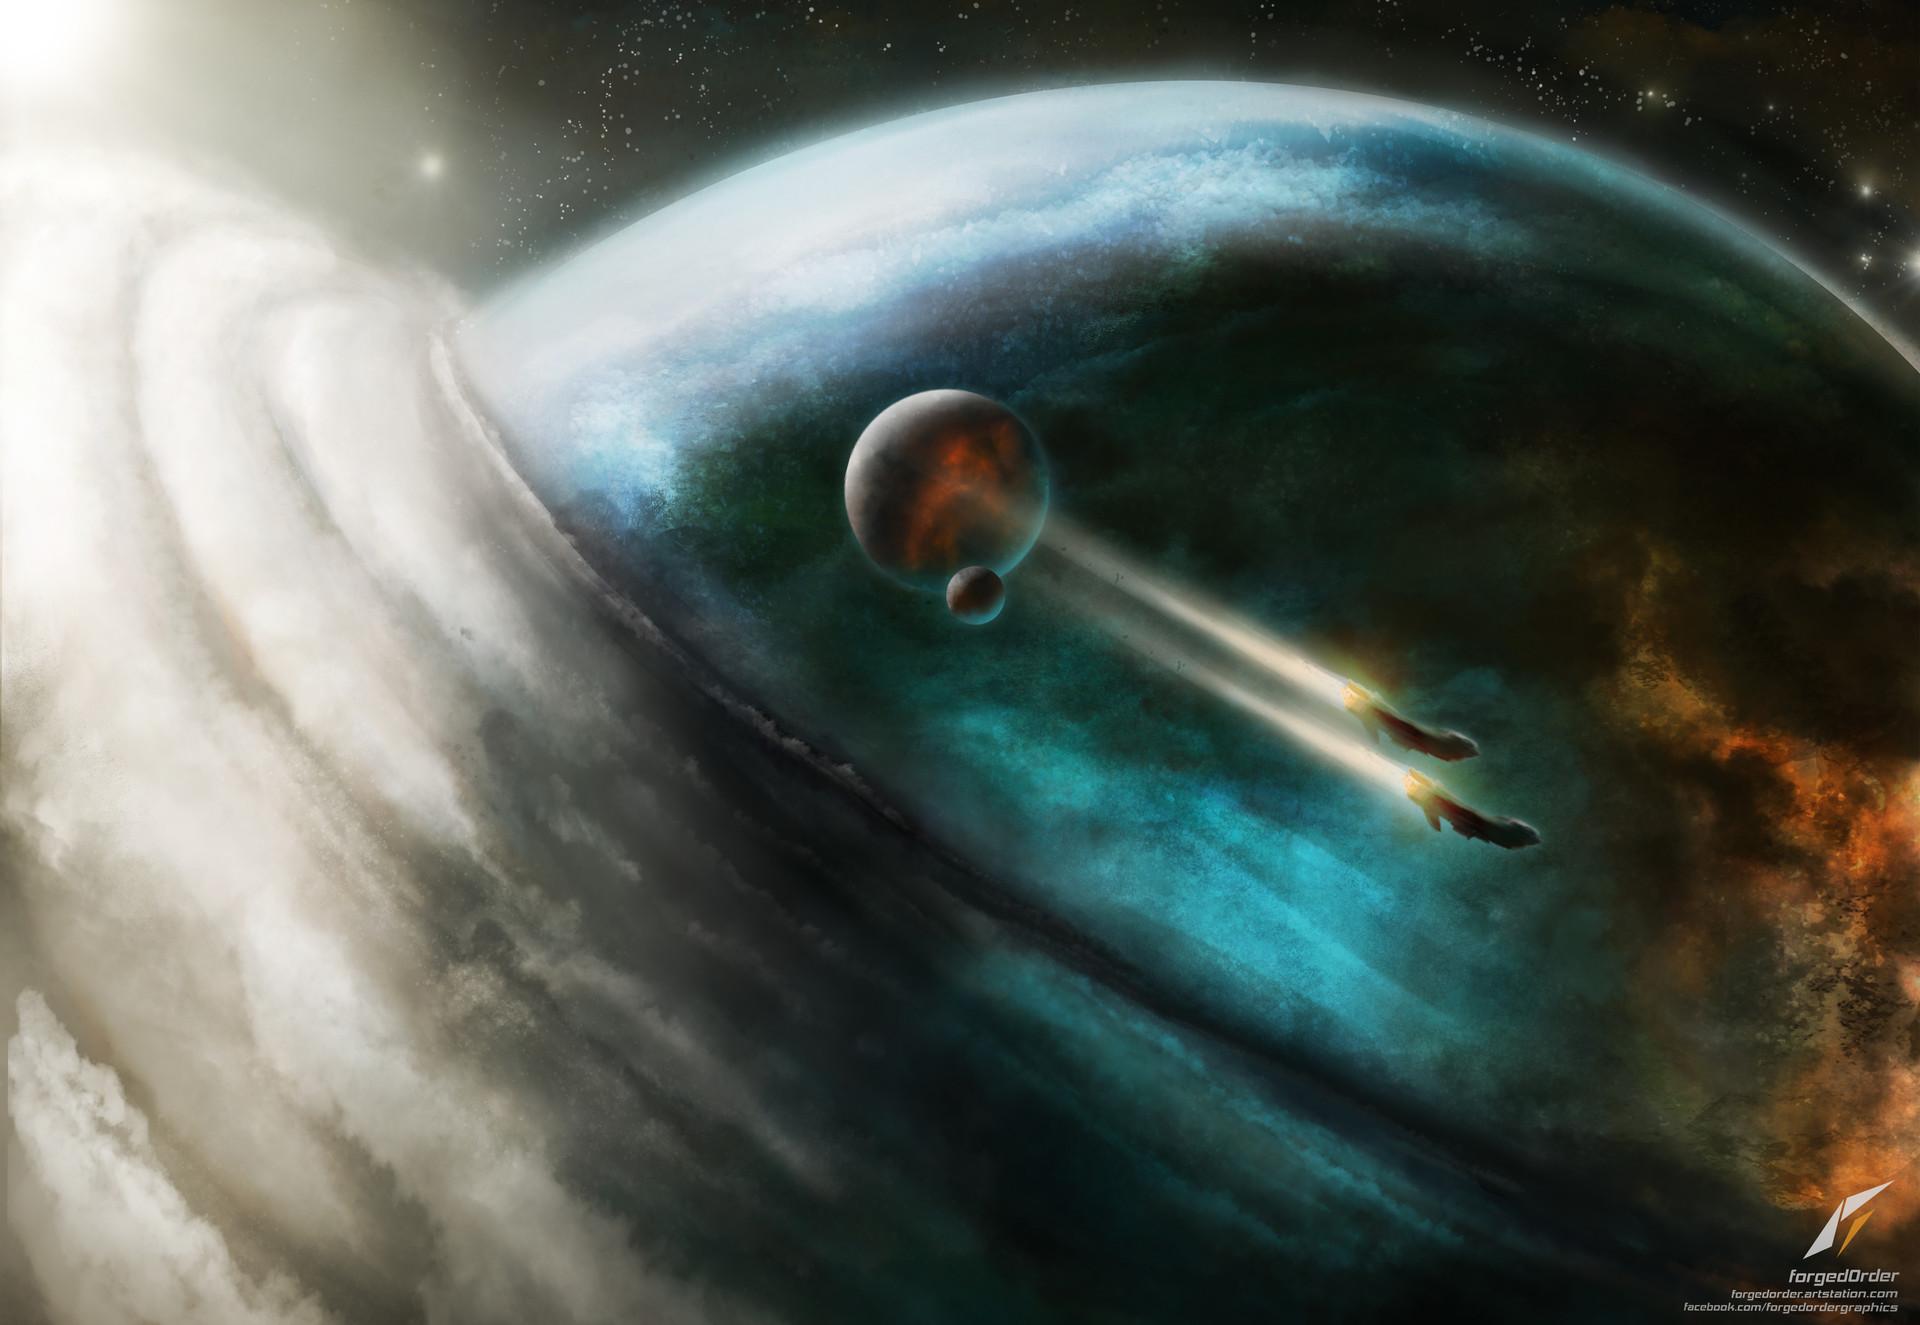 Attila gallik forgedorder into orbit2